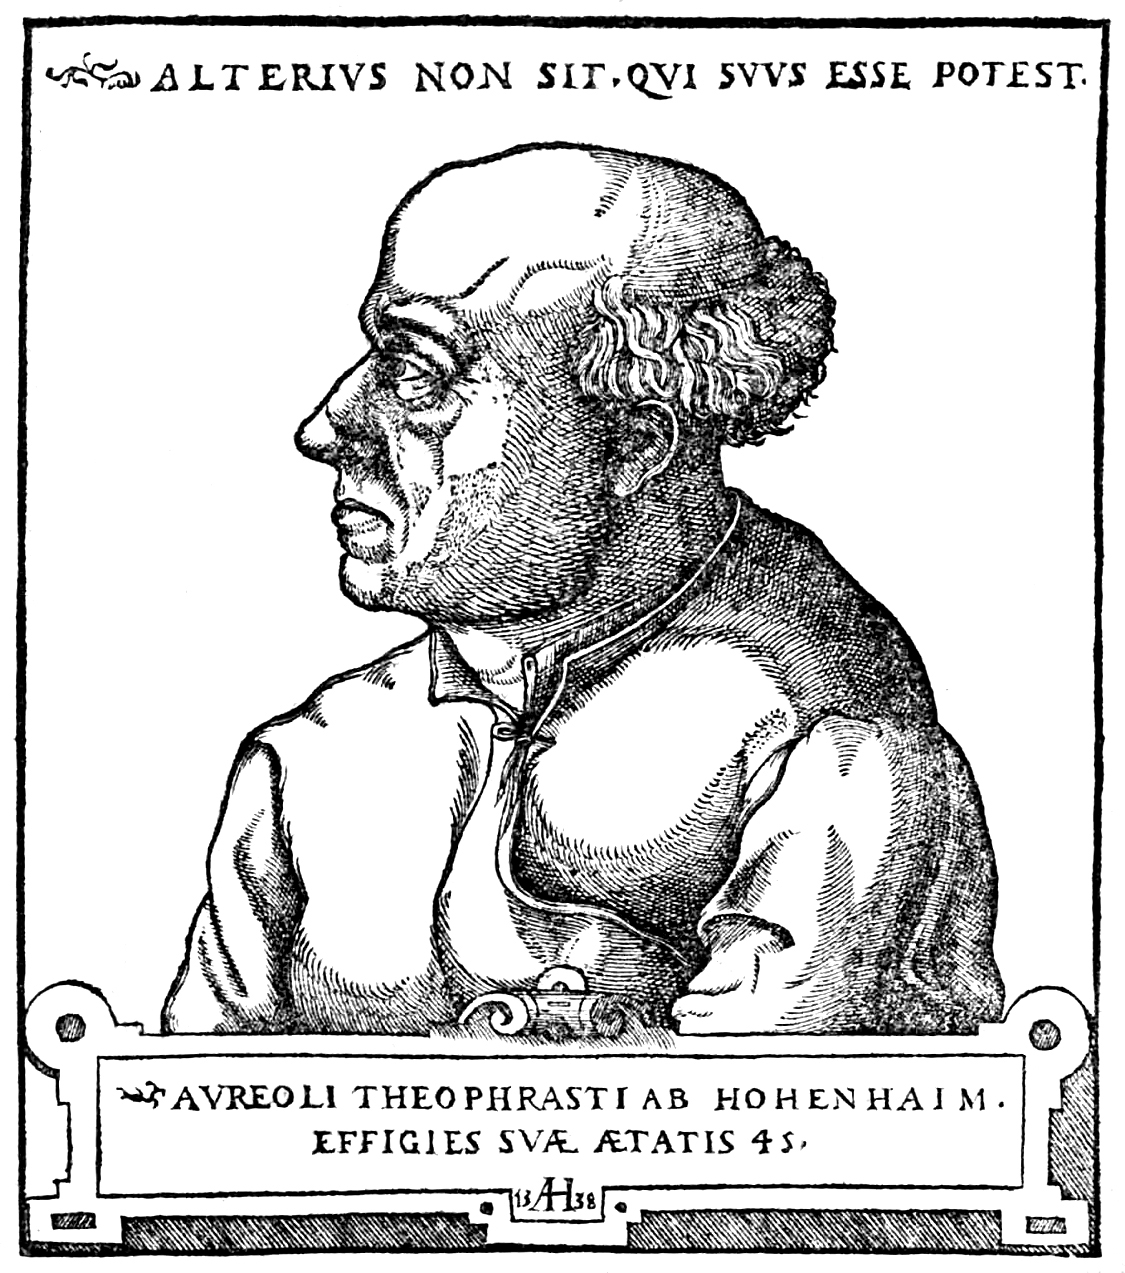 http://upload.wikimedia.org/wikipedia/commons/0/0b/Hirschvogel_Paracelsus.jpg